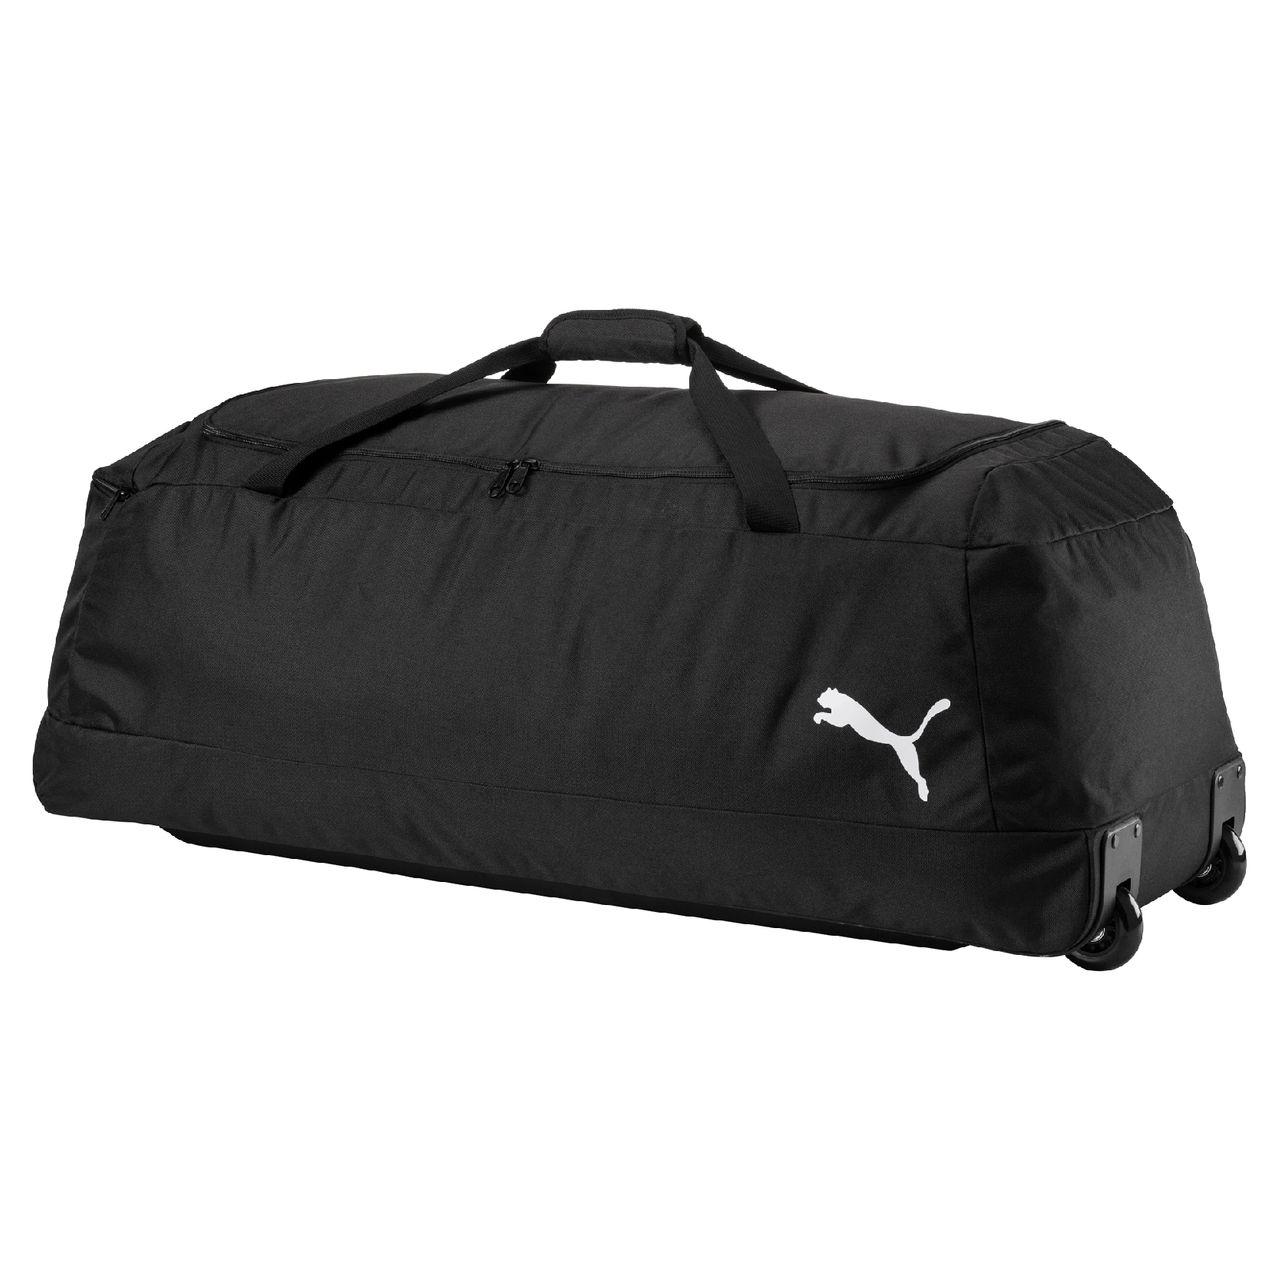 PUMA Pro Training II XLarge Rollentasche